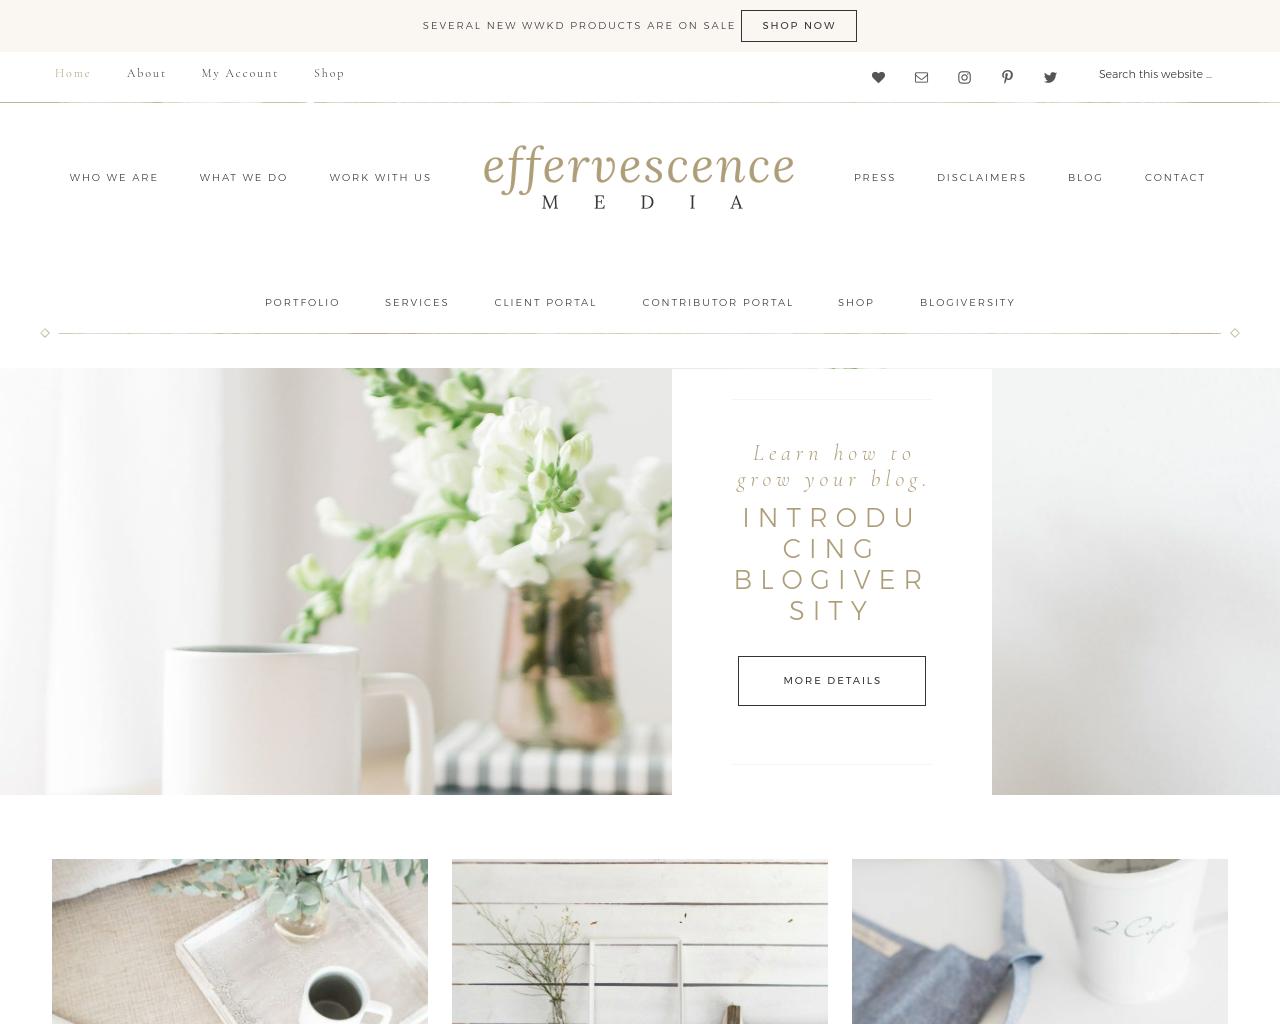 Effervescence-Media-Advertising-Reviews-Pricing